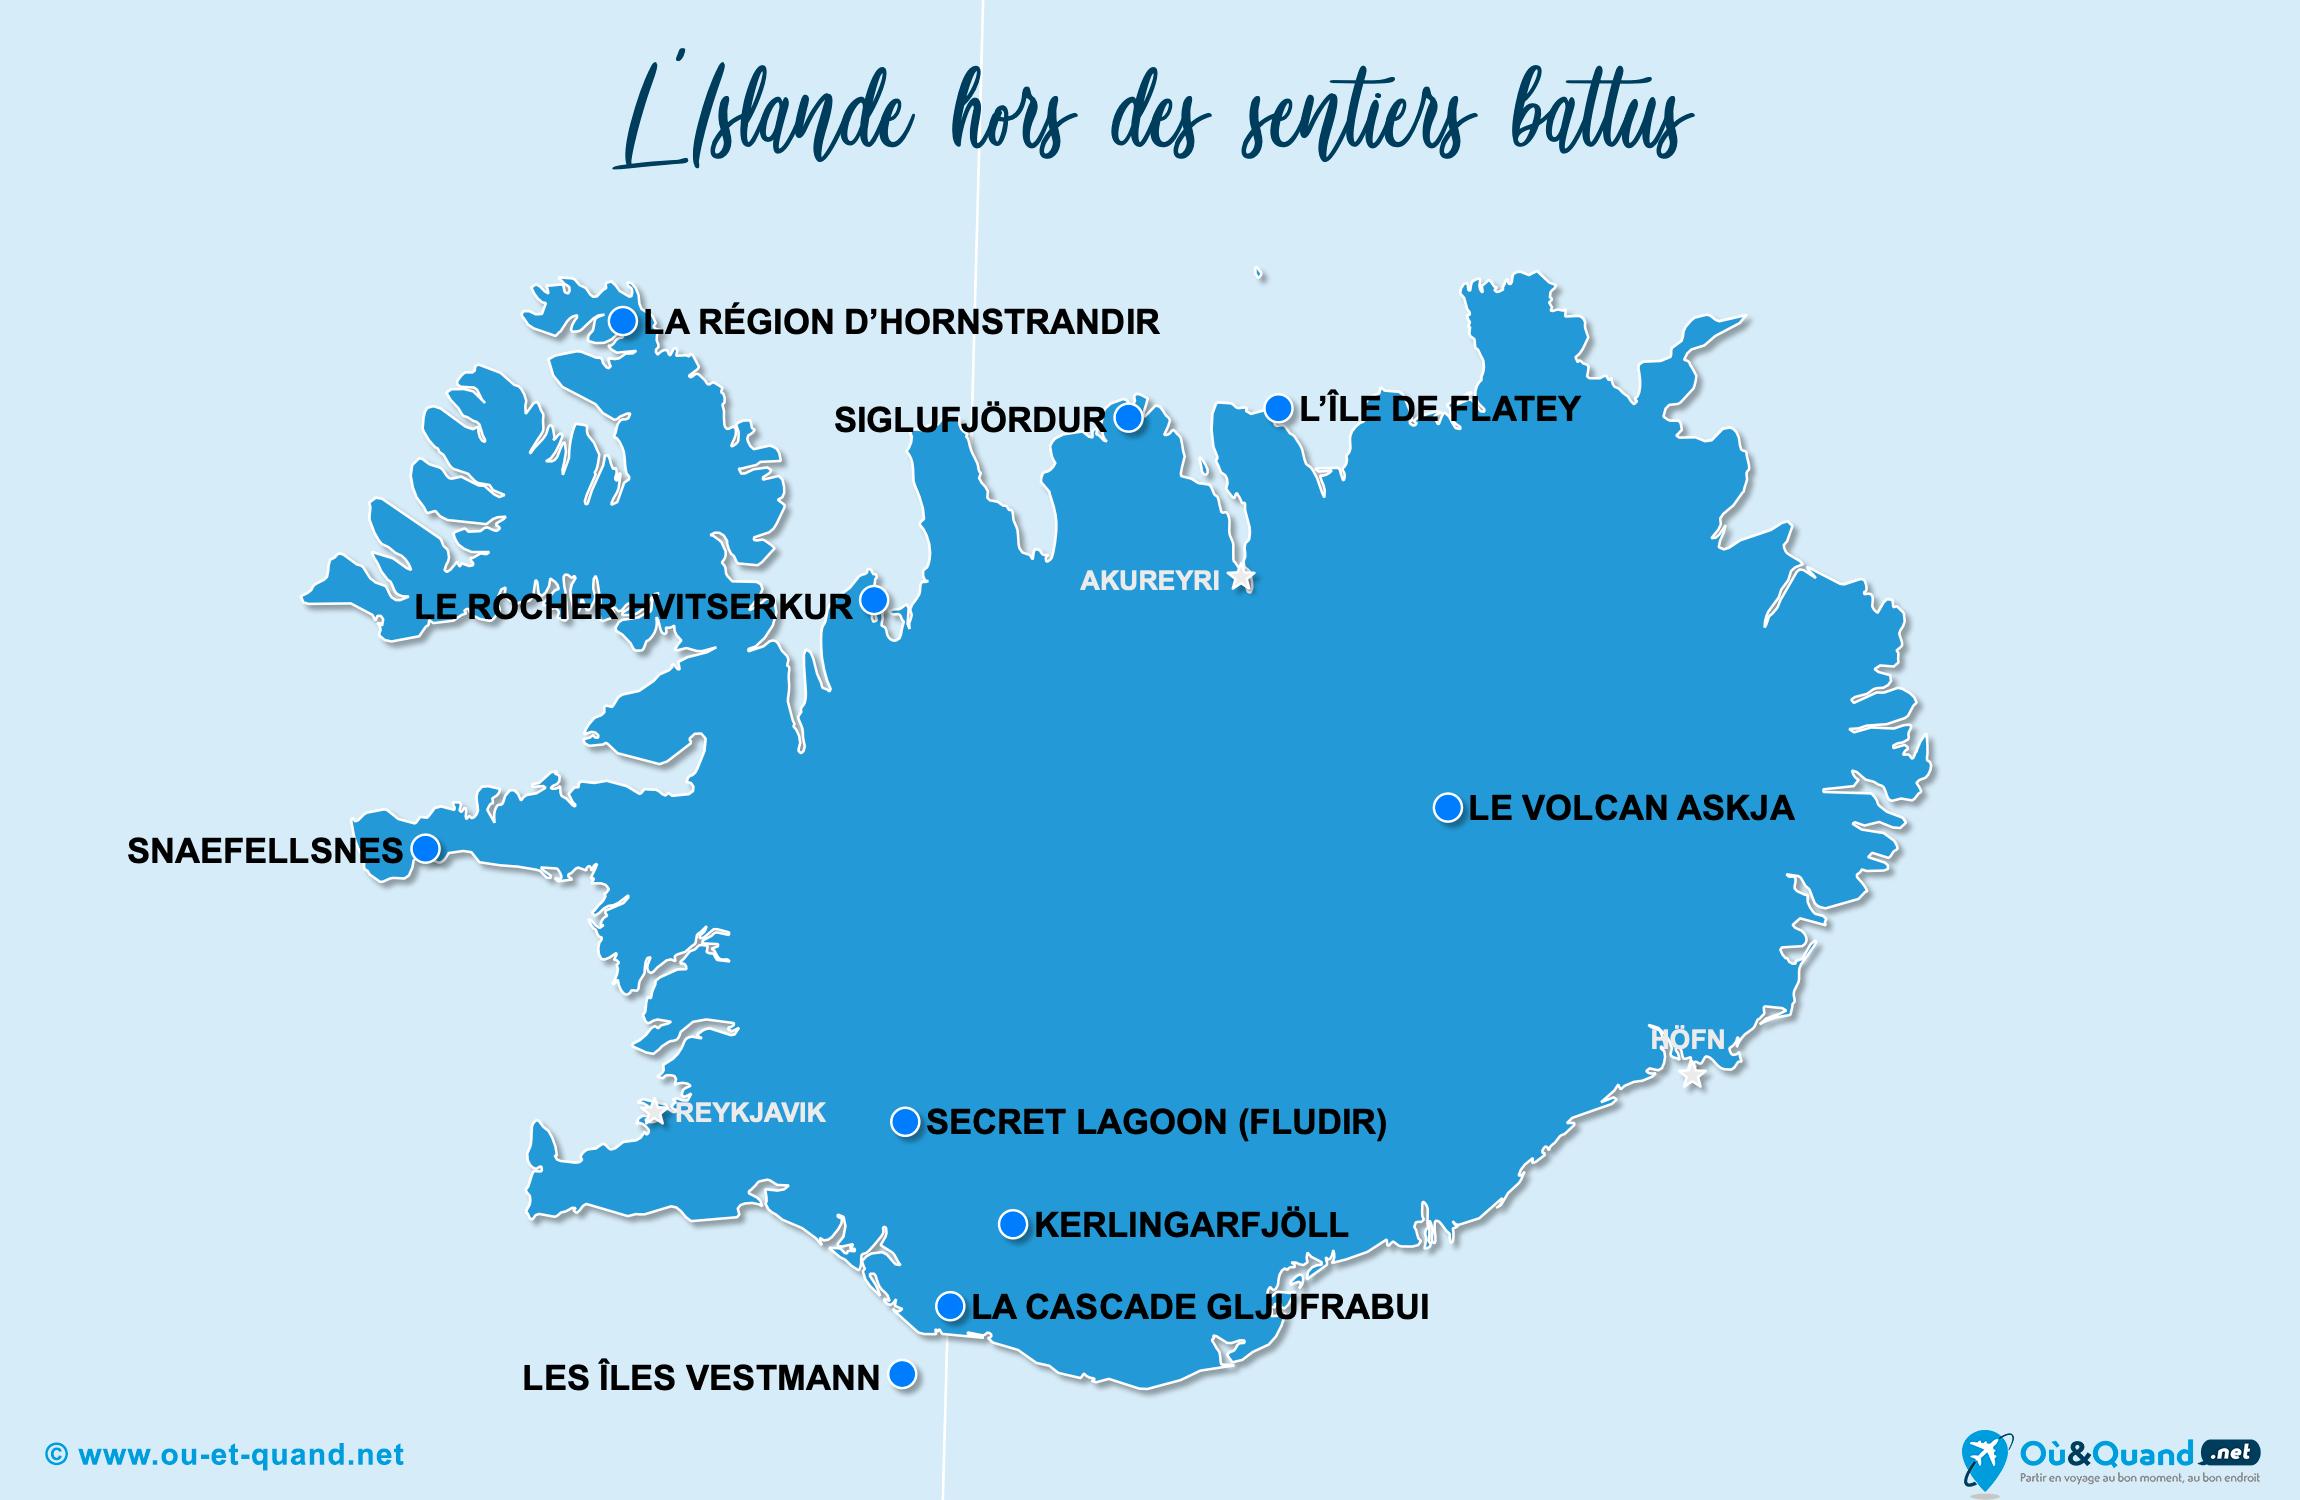 Carte Islande : L'Islande hors des sentiers battus